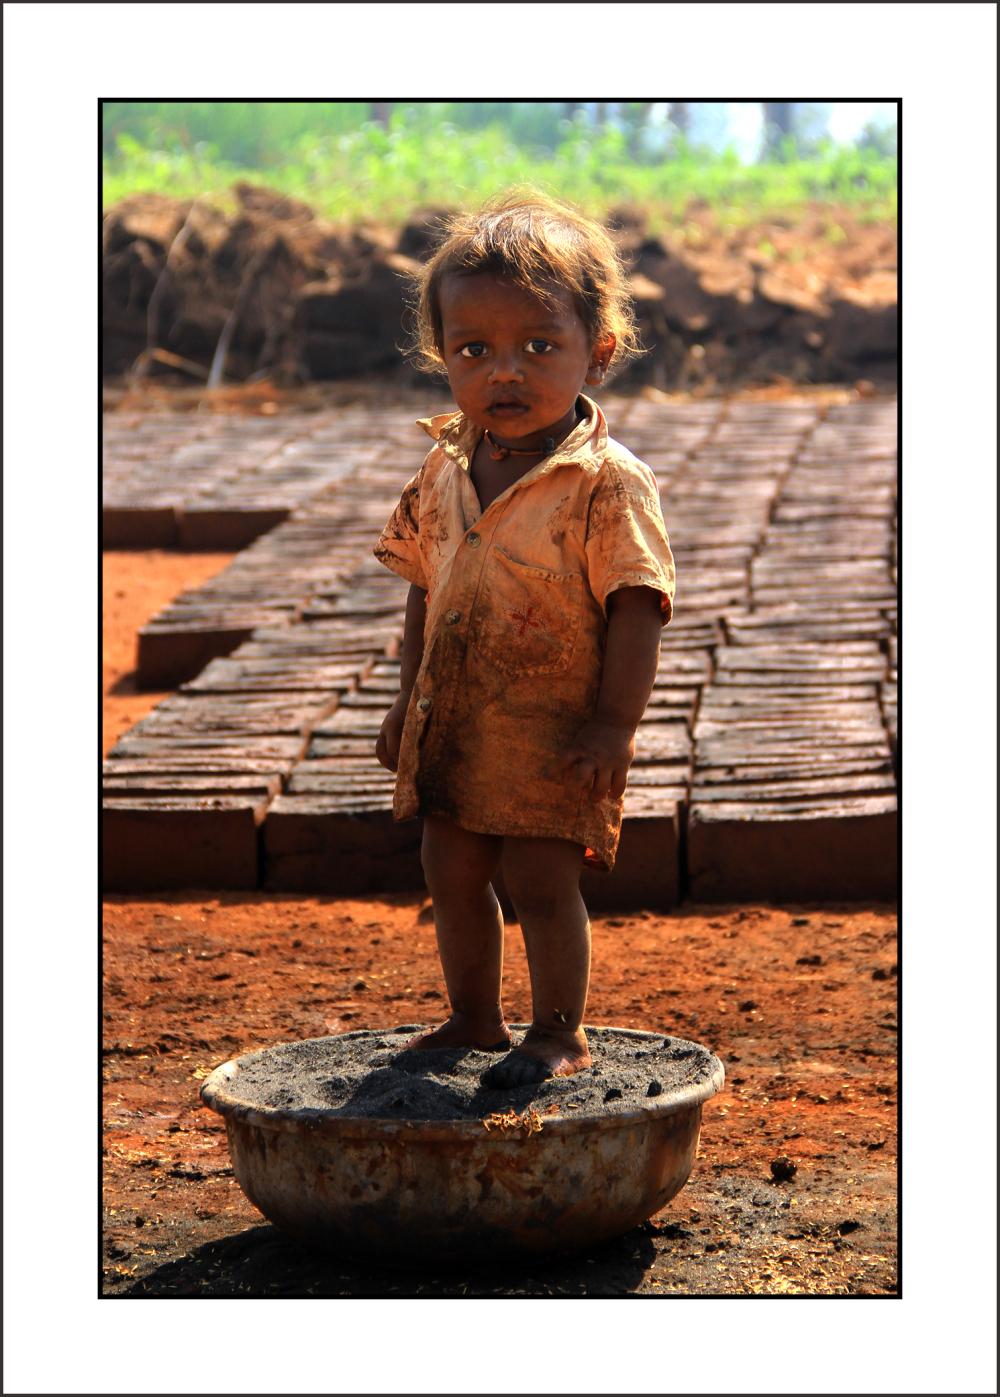 "..."" SMALL LIFE '' on bricks..."